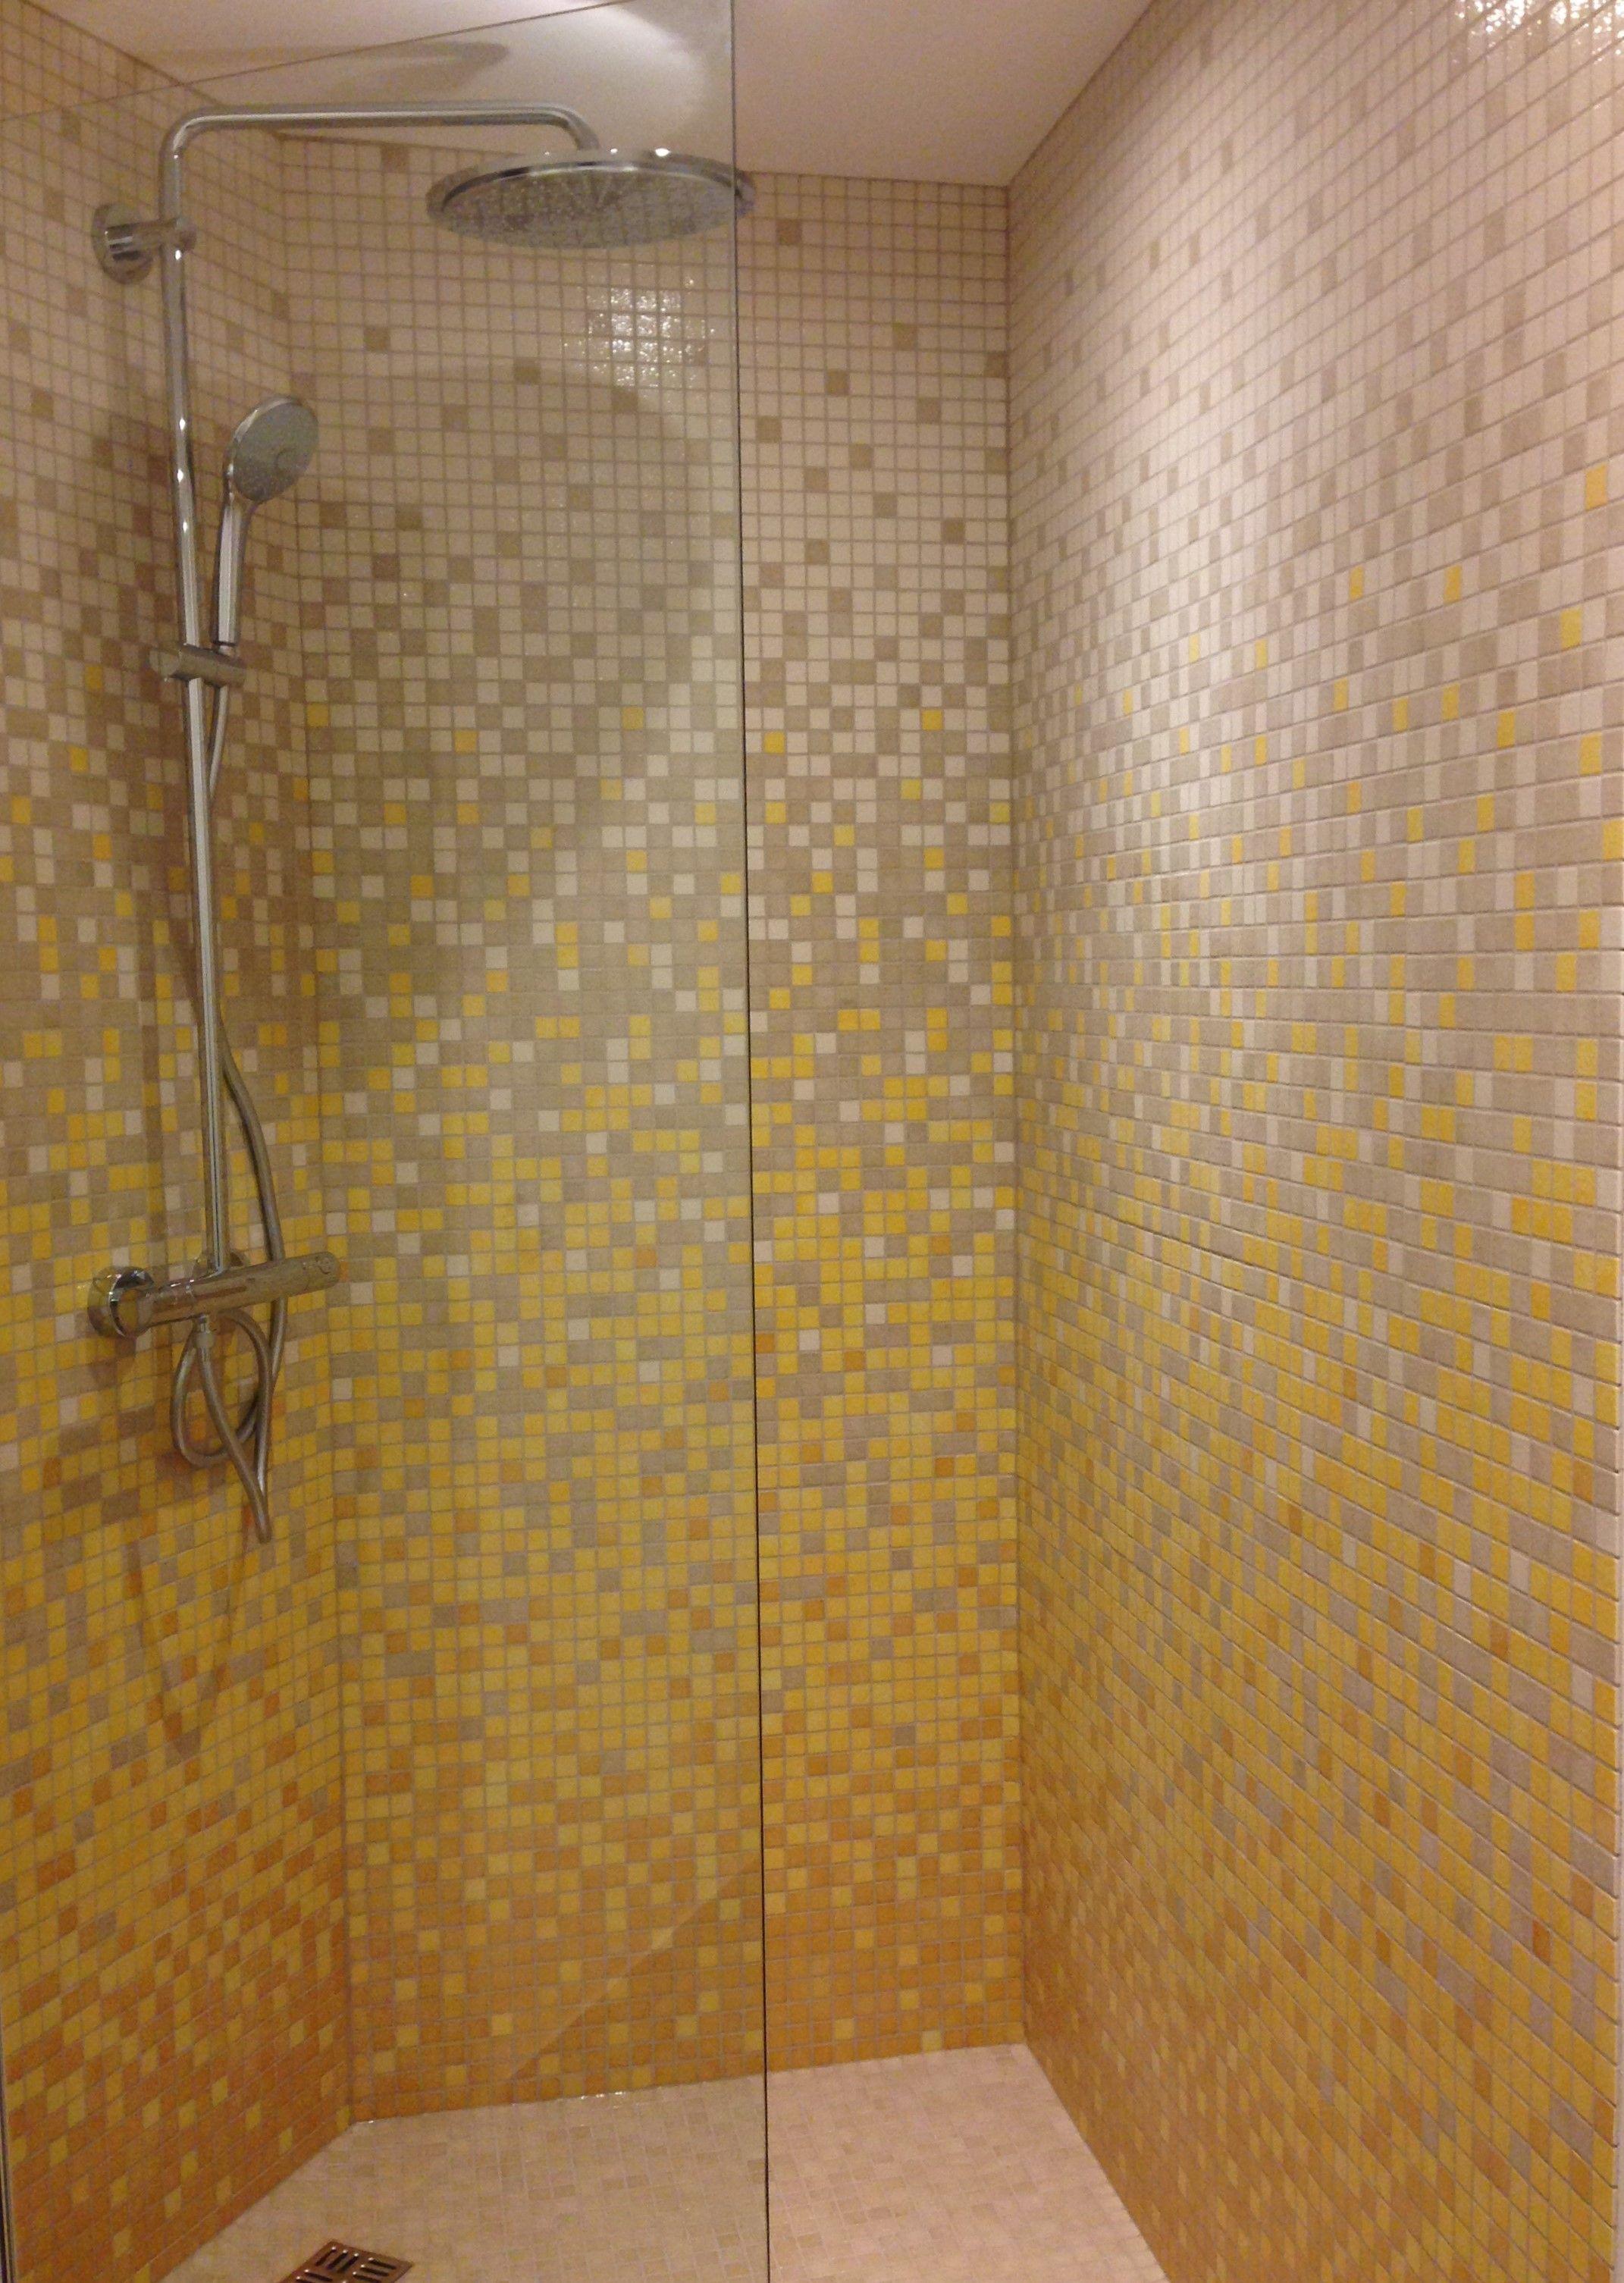 Magasin Meuble Salle De Bain Pau ~ douche r alis e en maux de briare salle de bain pinterest